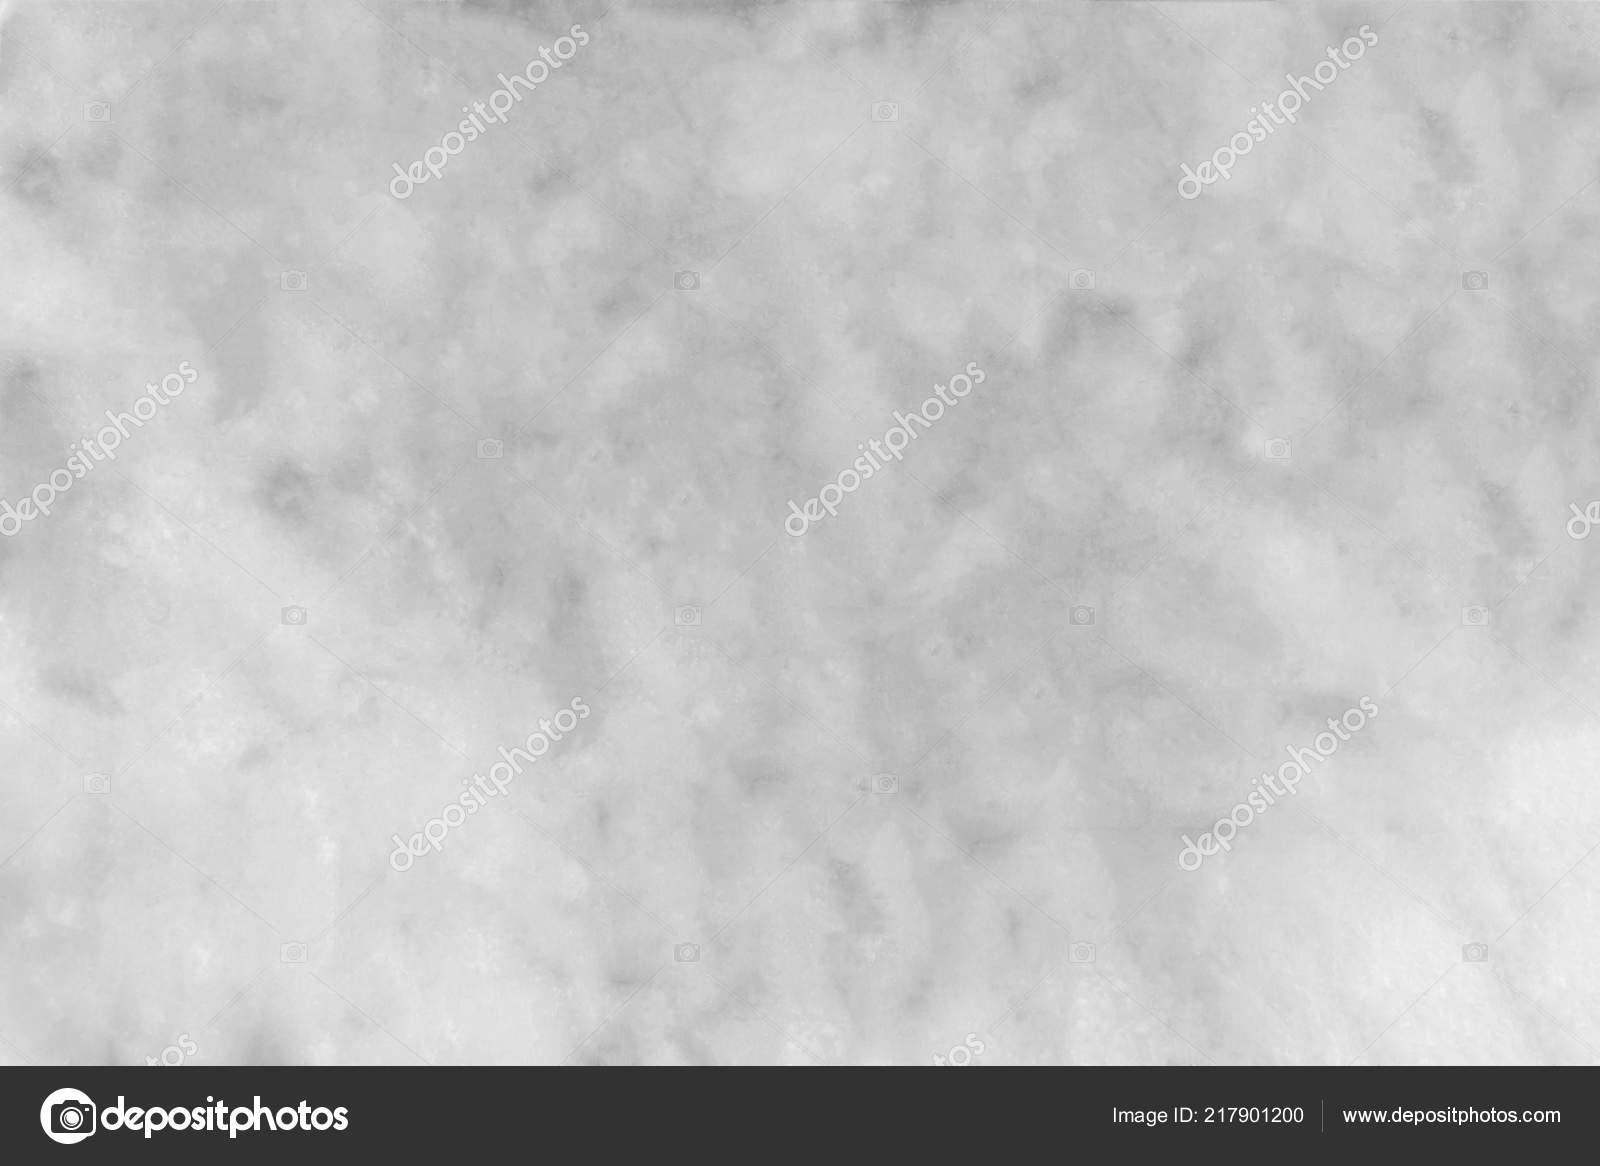 Grey Marble Stone Background Grey Marble Texture Wall Pattern Interior Stock Photo C Nokfreelance 217901200